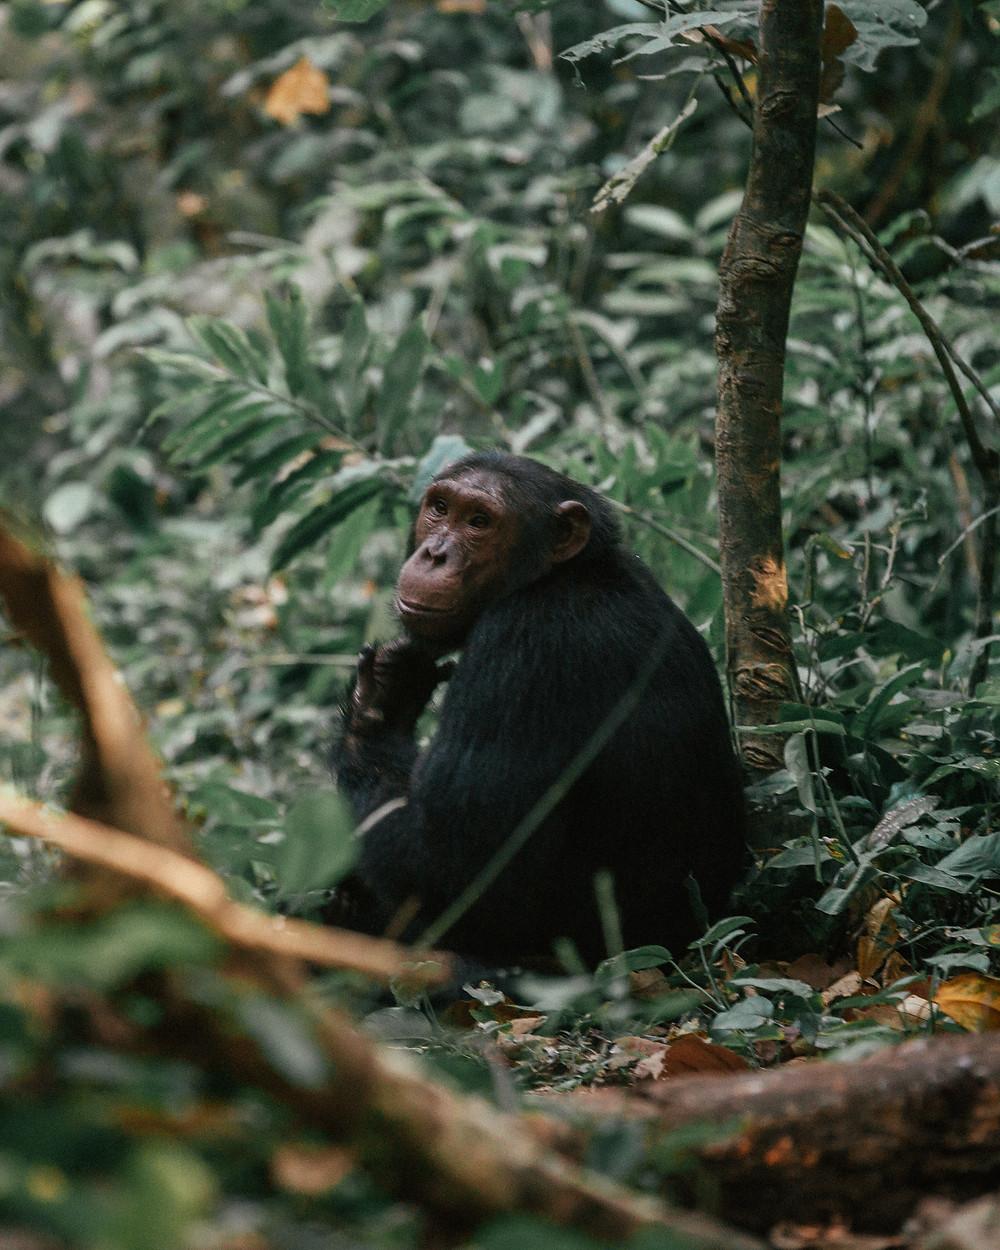 Chimpanzee Trek, Kyambura Gorge, Uganda